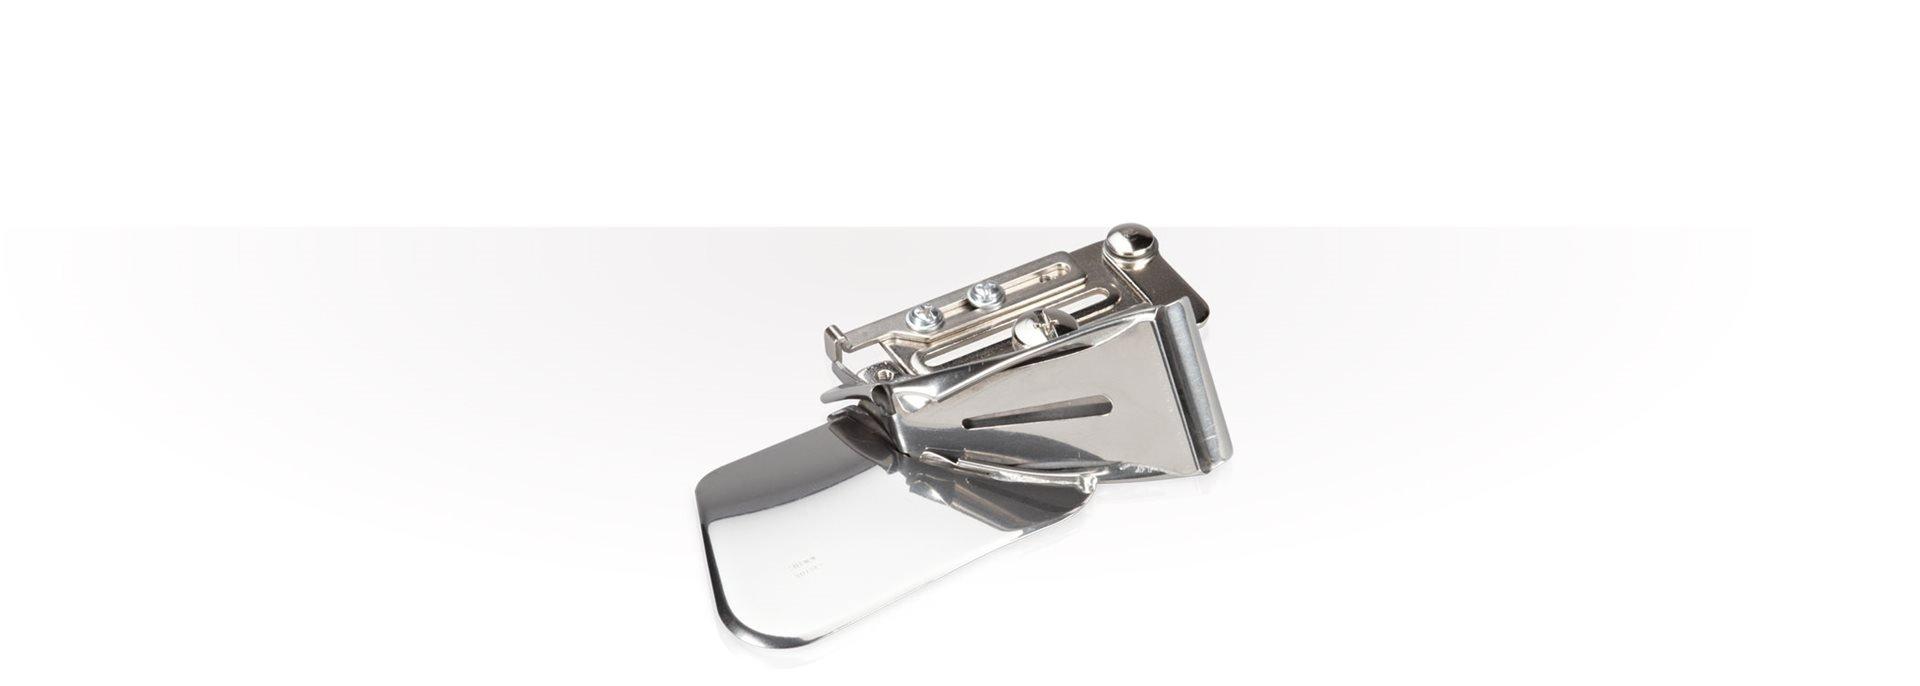 Bernina - #88 38mm Binder Attachment (no foot)